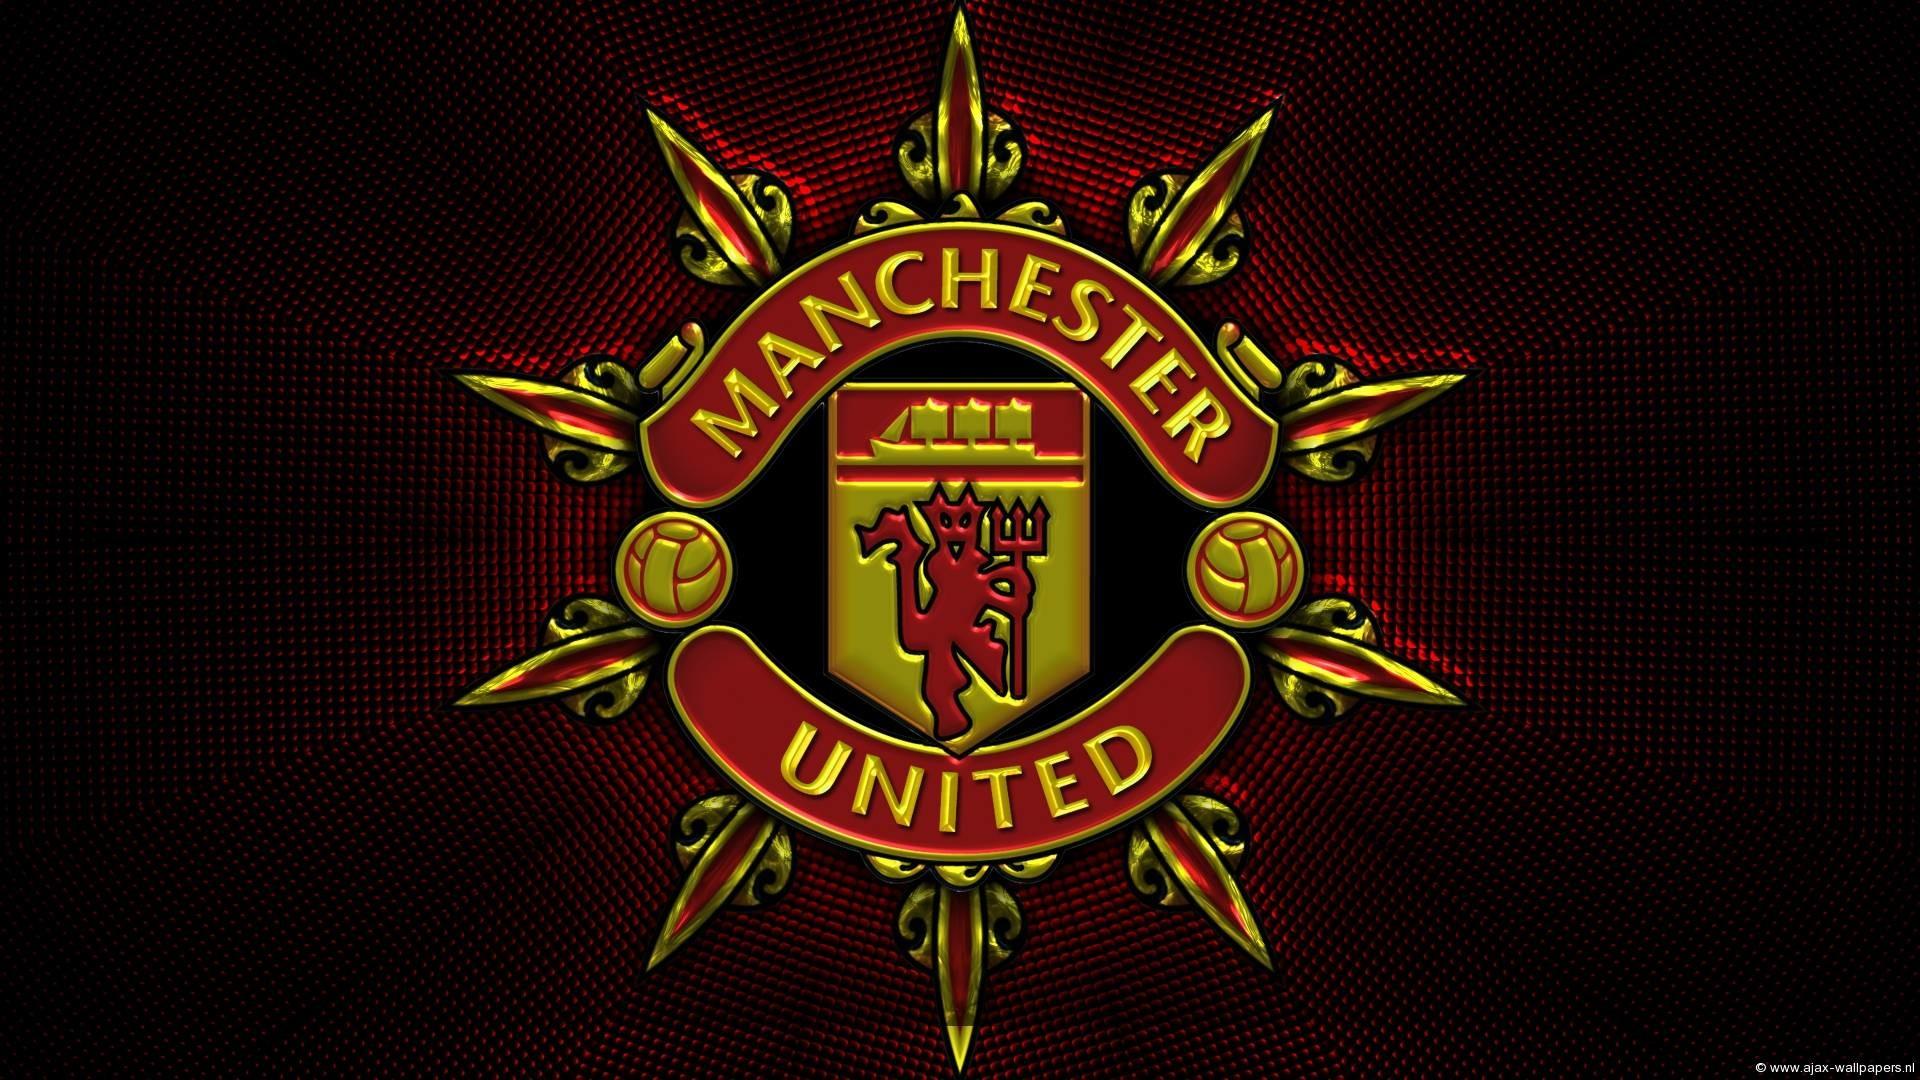 Manchester United Wallpaper Iphone X Manchester United Wallpaper 3d 2018 183 ①